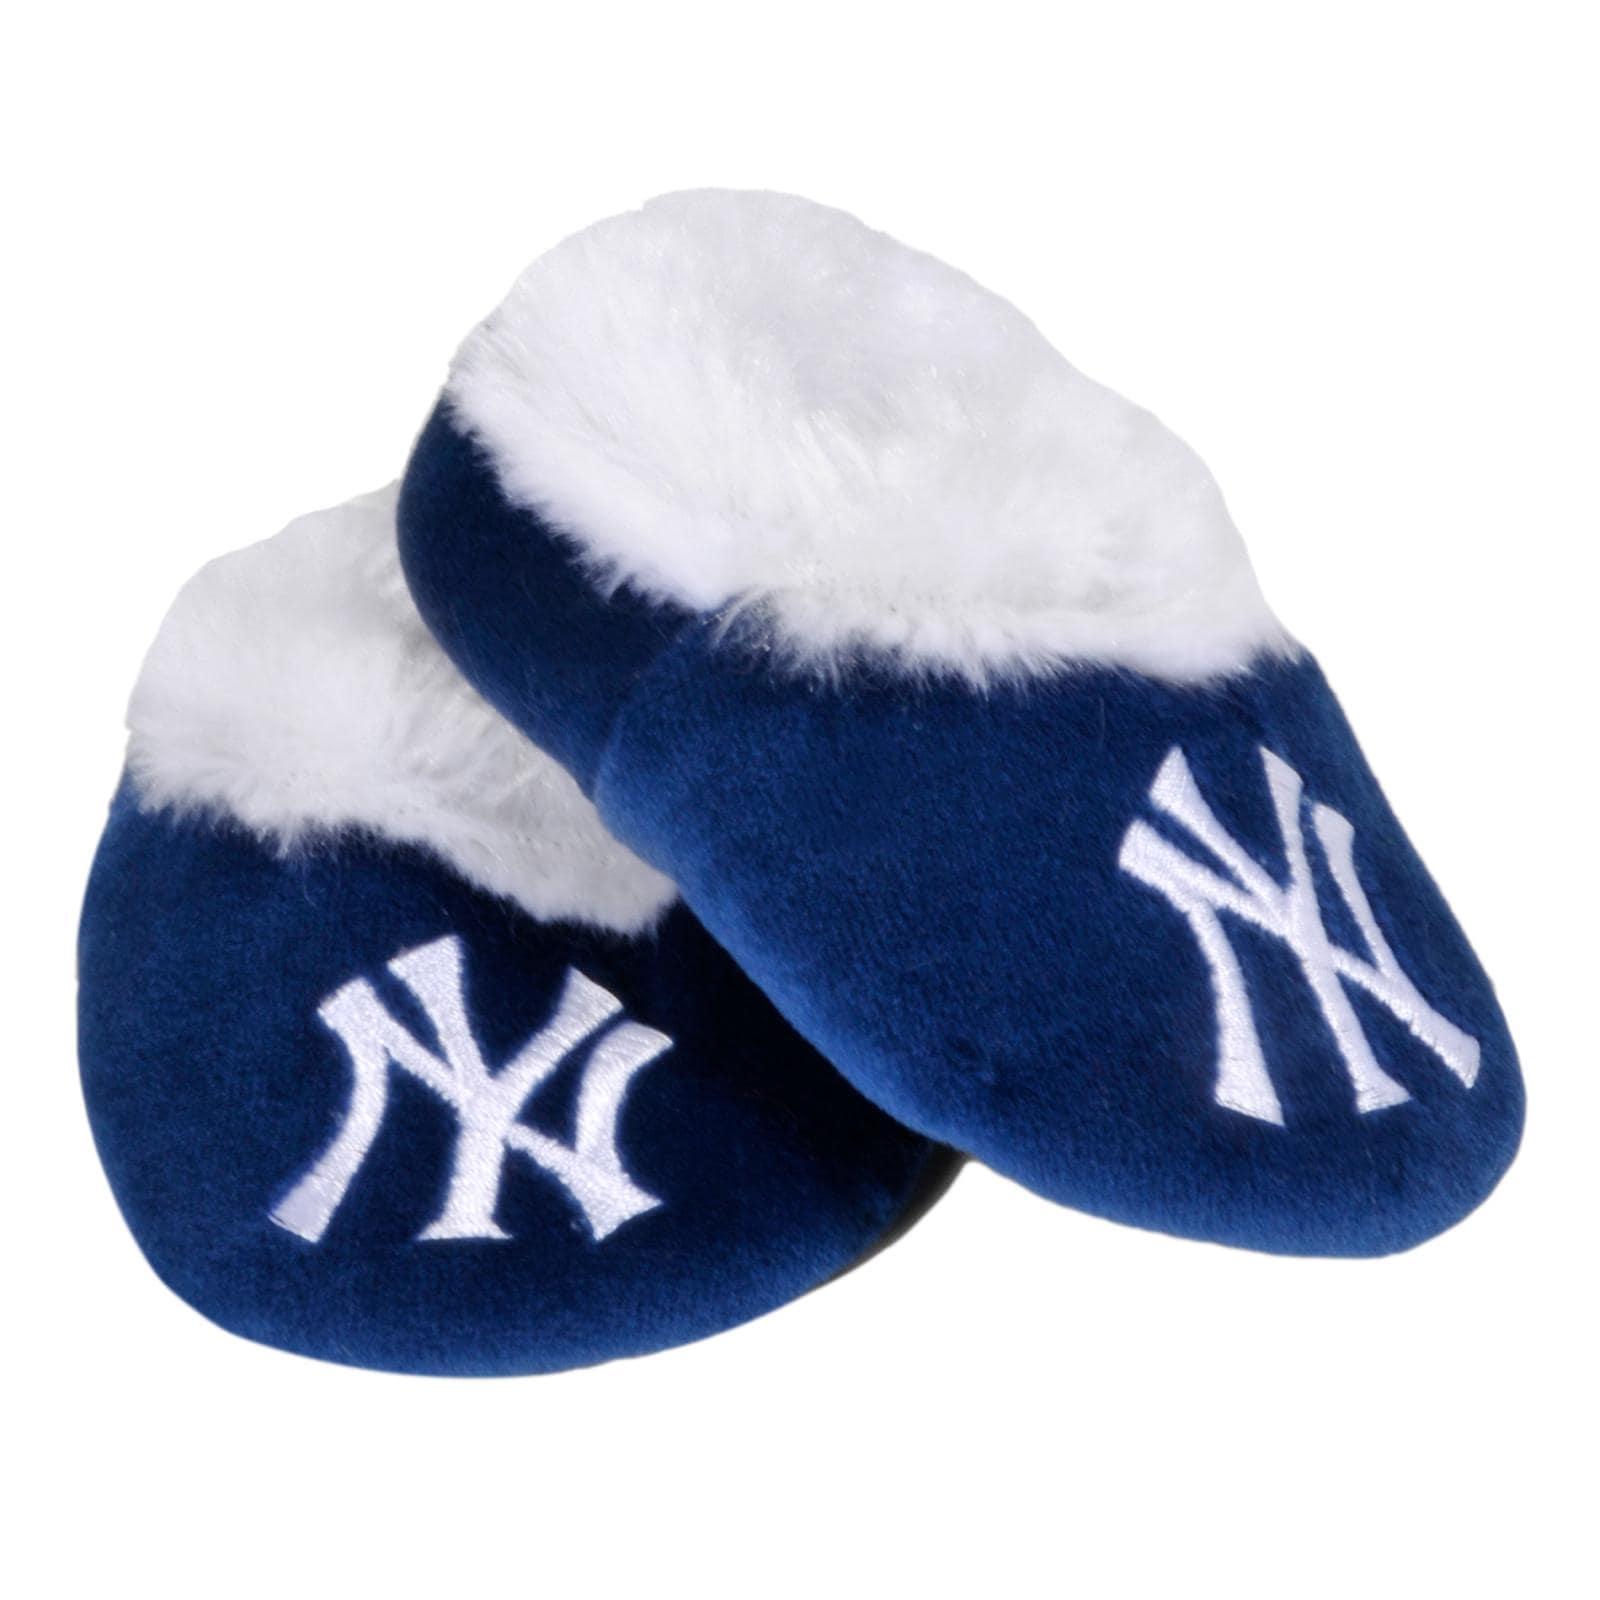 New York Yankees Baby Bootie Slippers